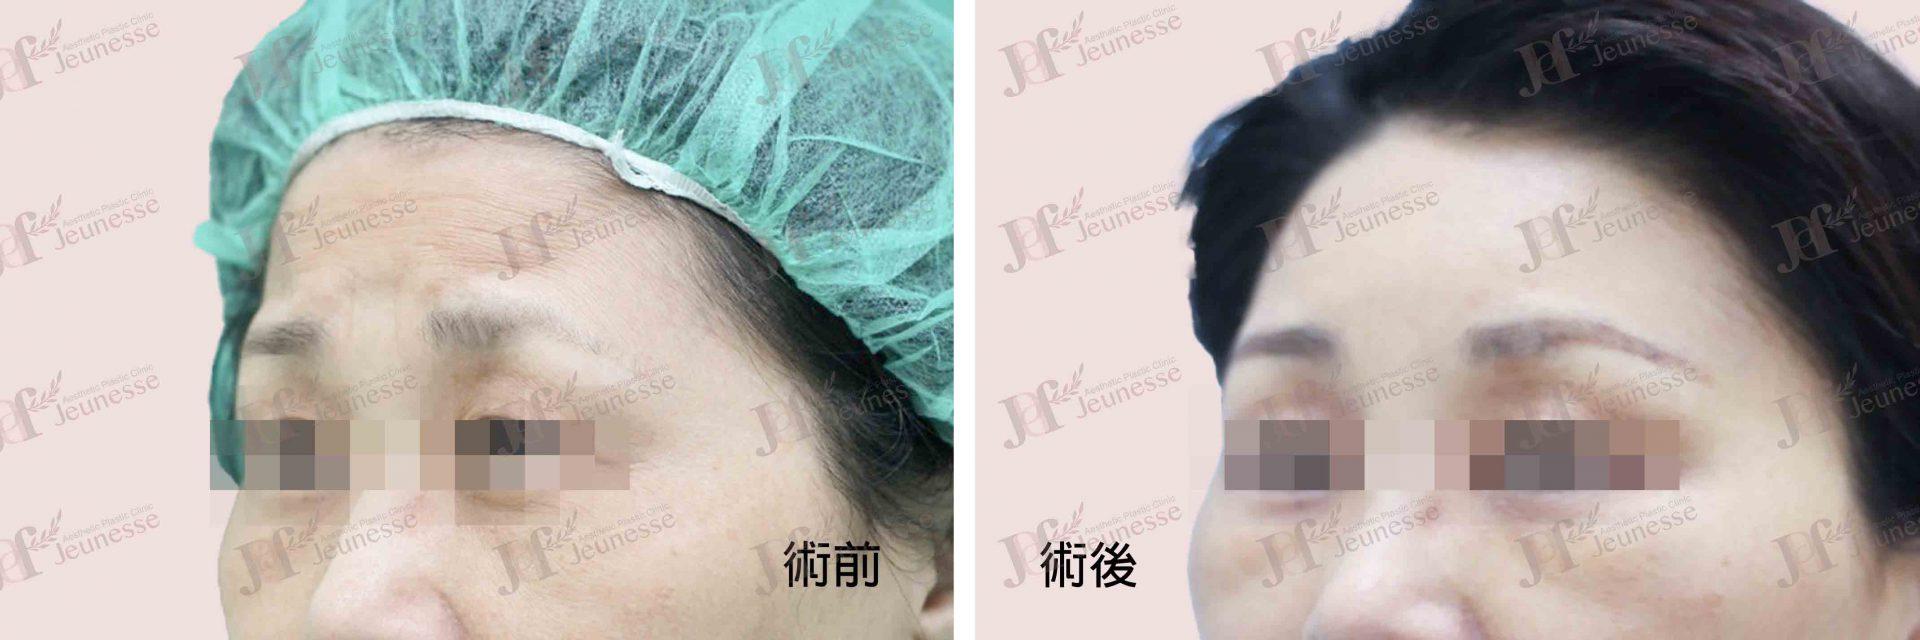 Forehead lifting case 2 45度左臉術前-浮水印